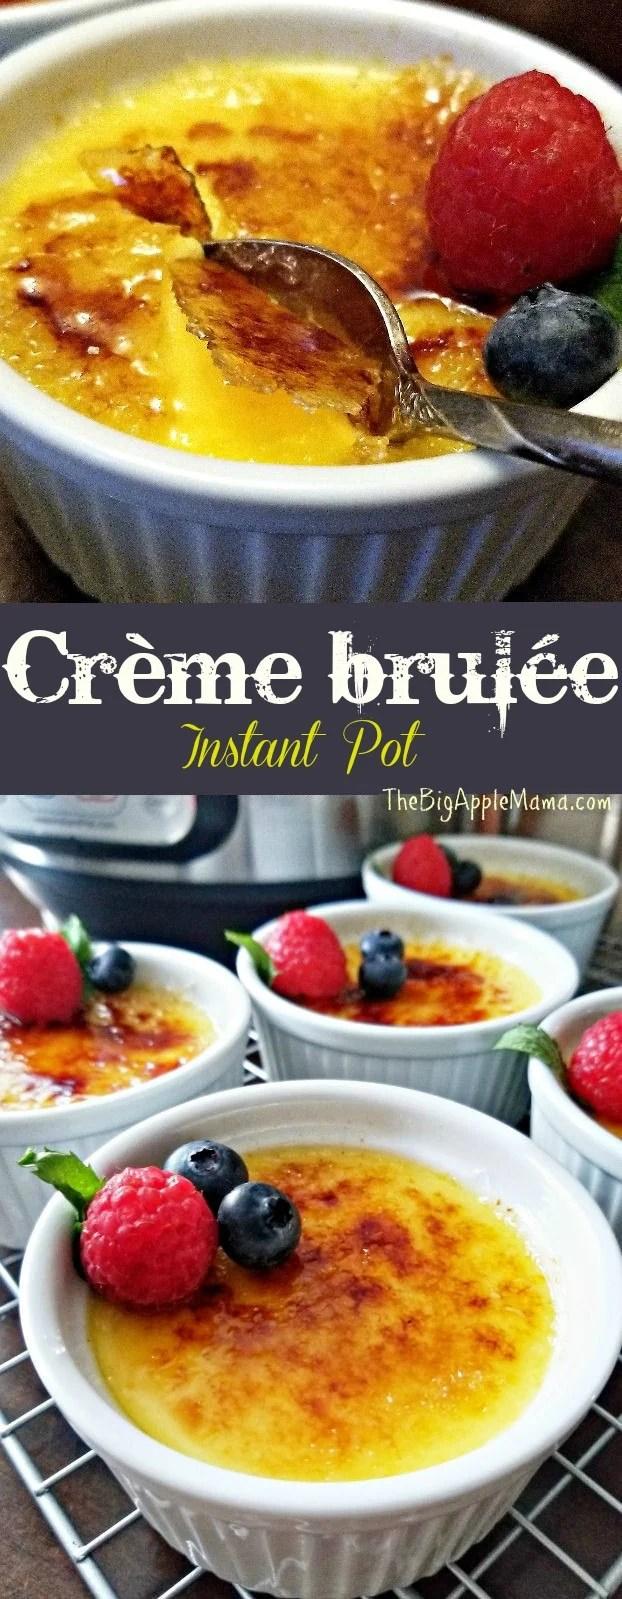 Instant Pot Creme Brulee: The BEST Recipe for Creme Brulee